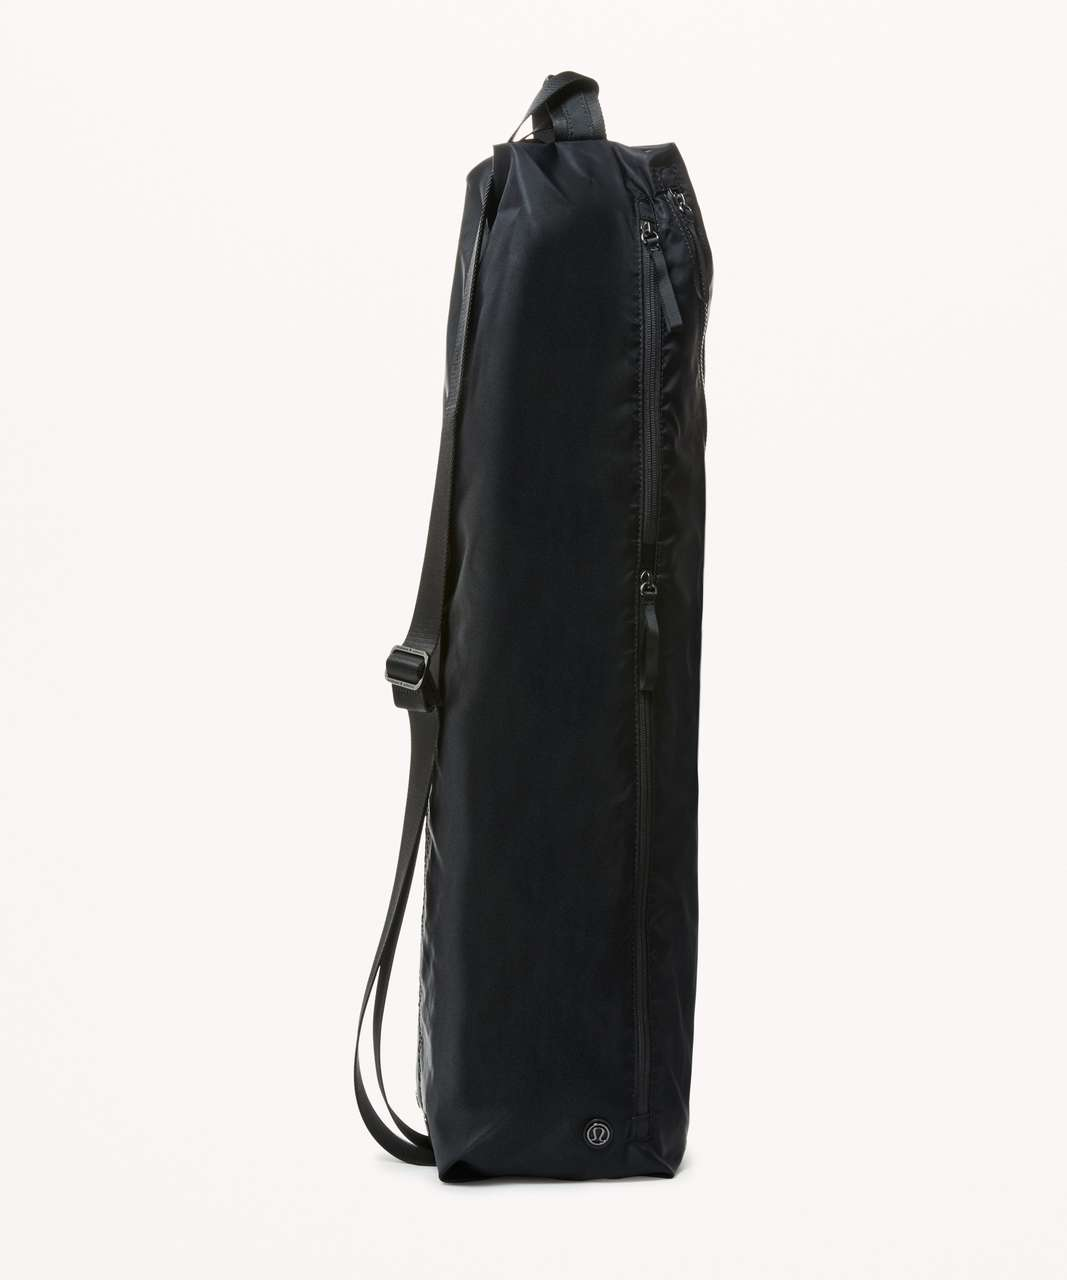 Lululemon Yoga Starter Kit - Black / Black / Purist Shots And Squats